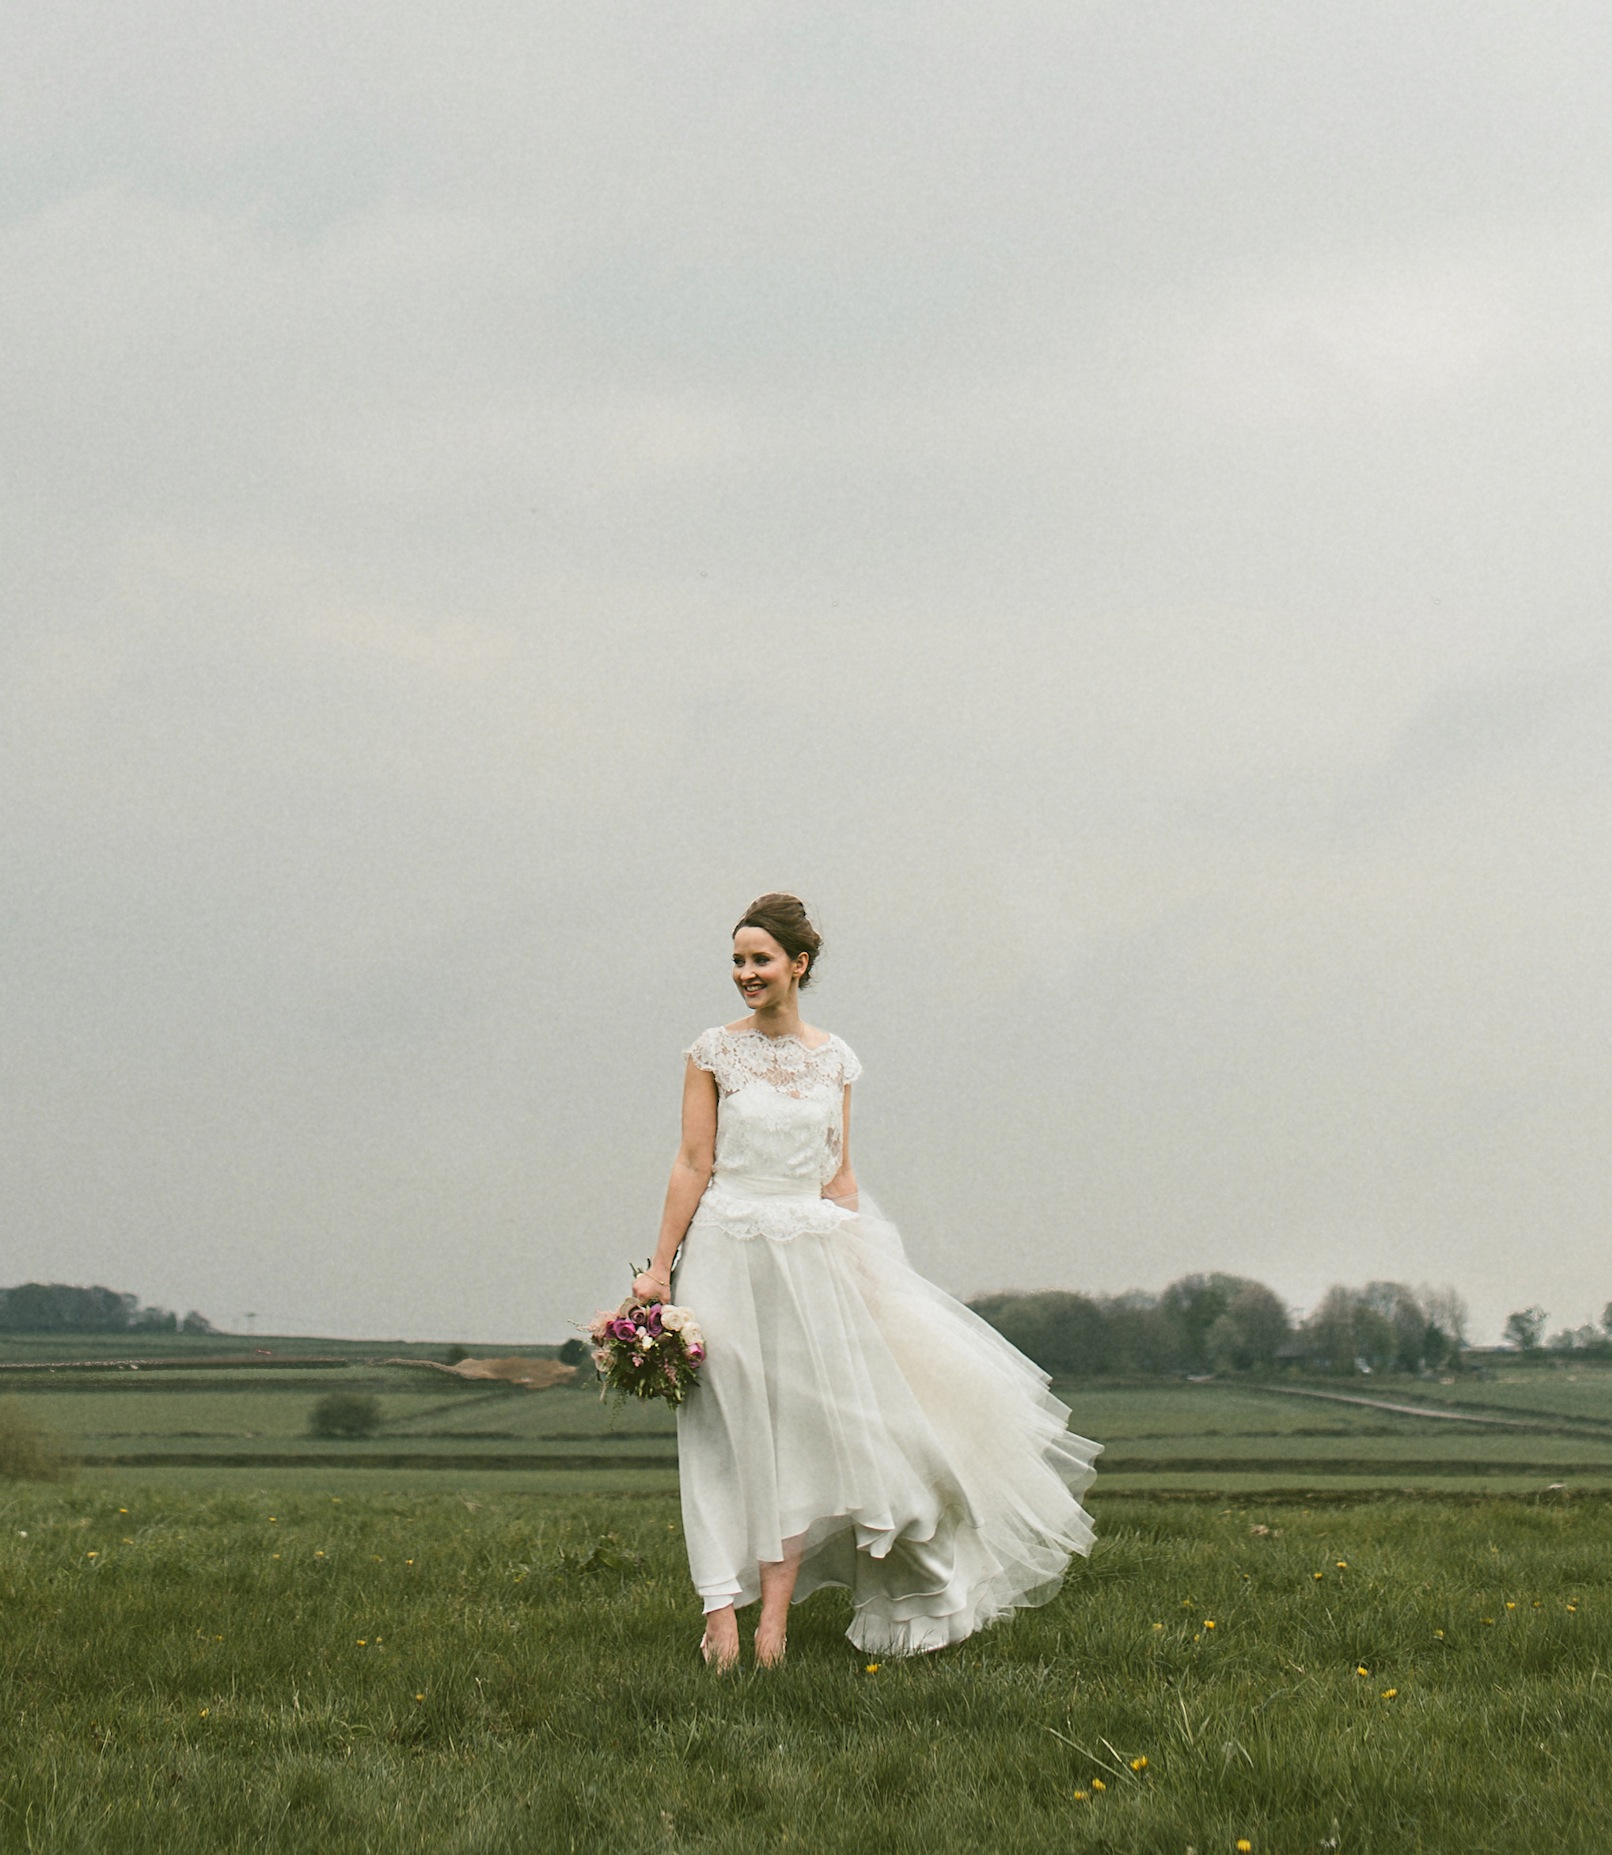 Samantha-Yorkshire-Sheffield-Bespoke-Vintage-Lace-Tulle-Bride-Wedding-Dress-Susanna-Greening-Derbyshire-5